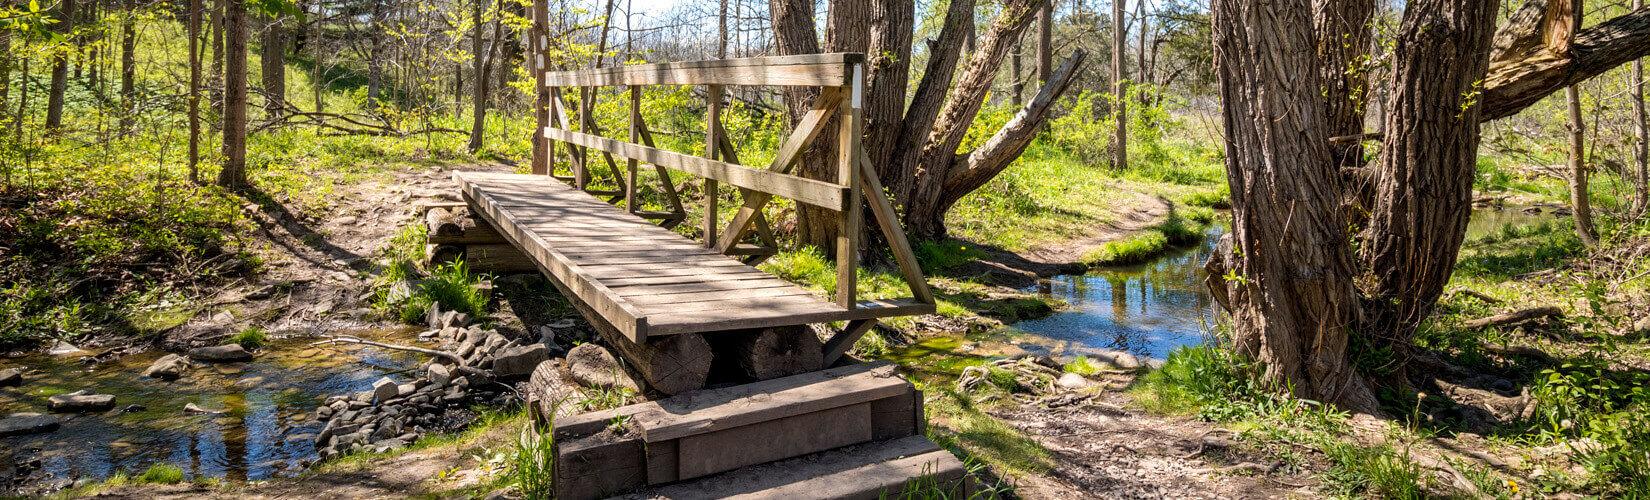 Short Hills Provincial Park: Hiking in Niagara's Largest Park :: I've Been Bit! Travel Blog